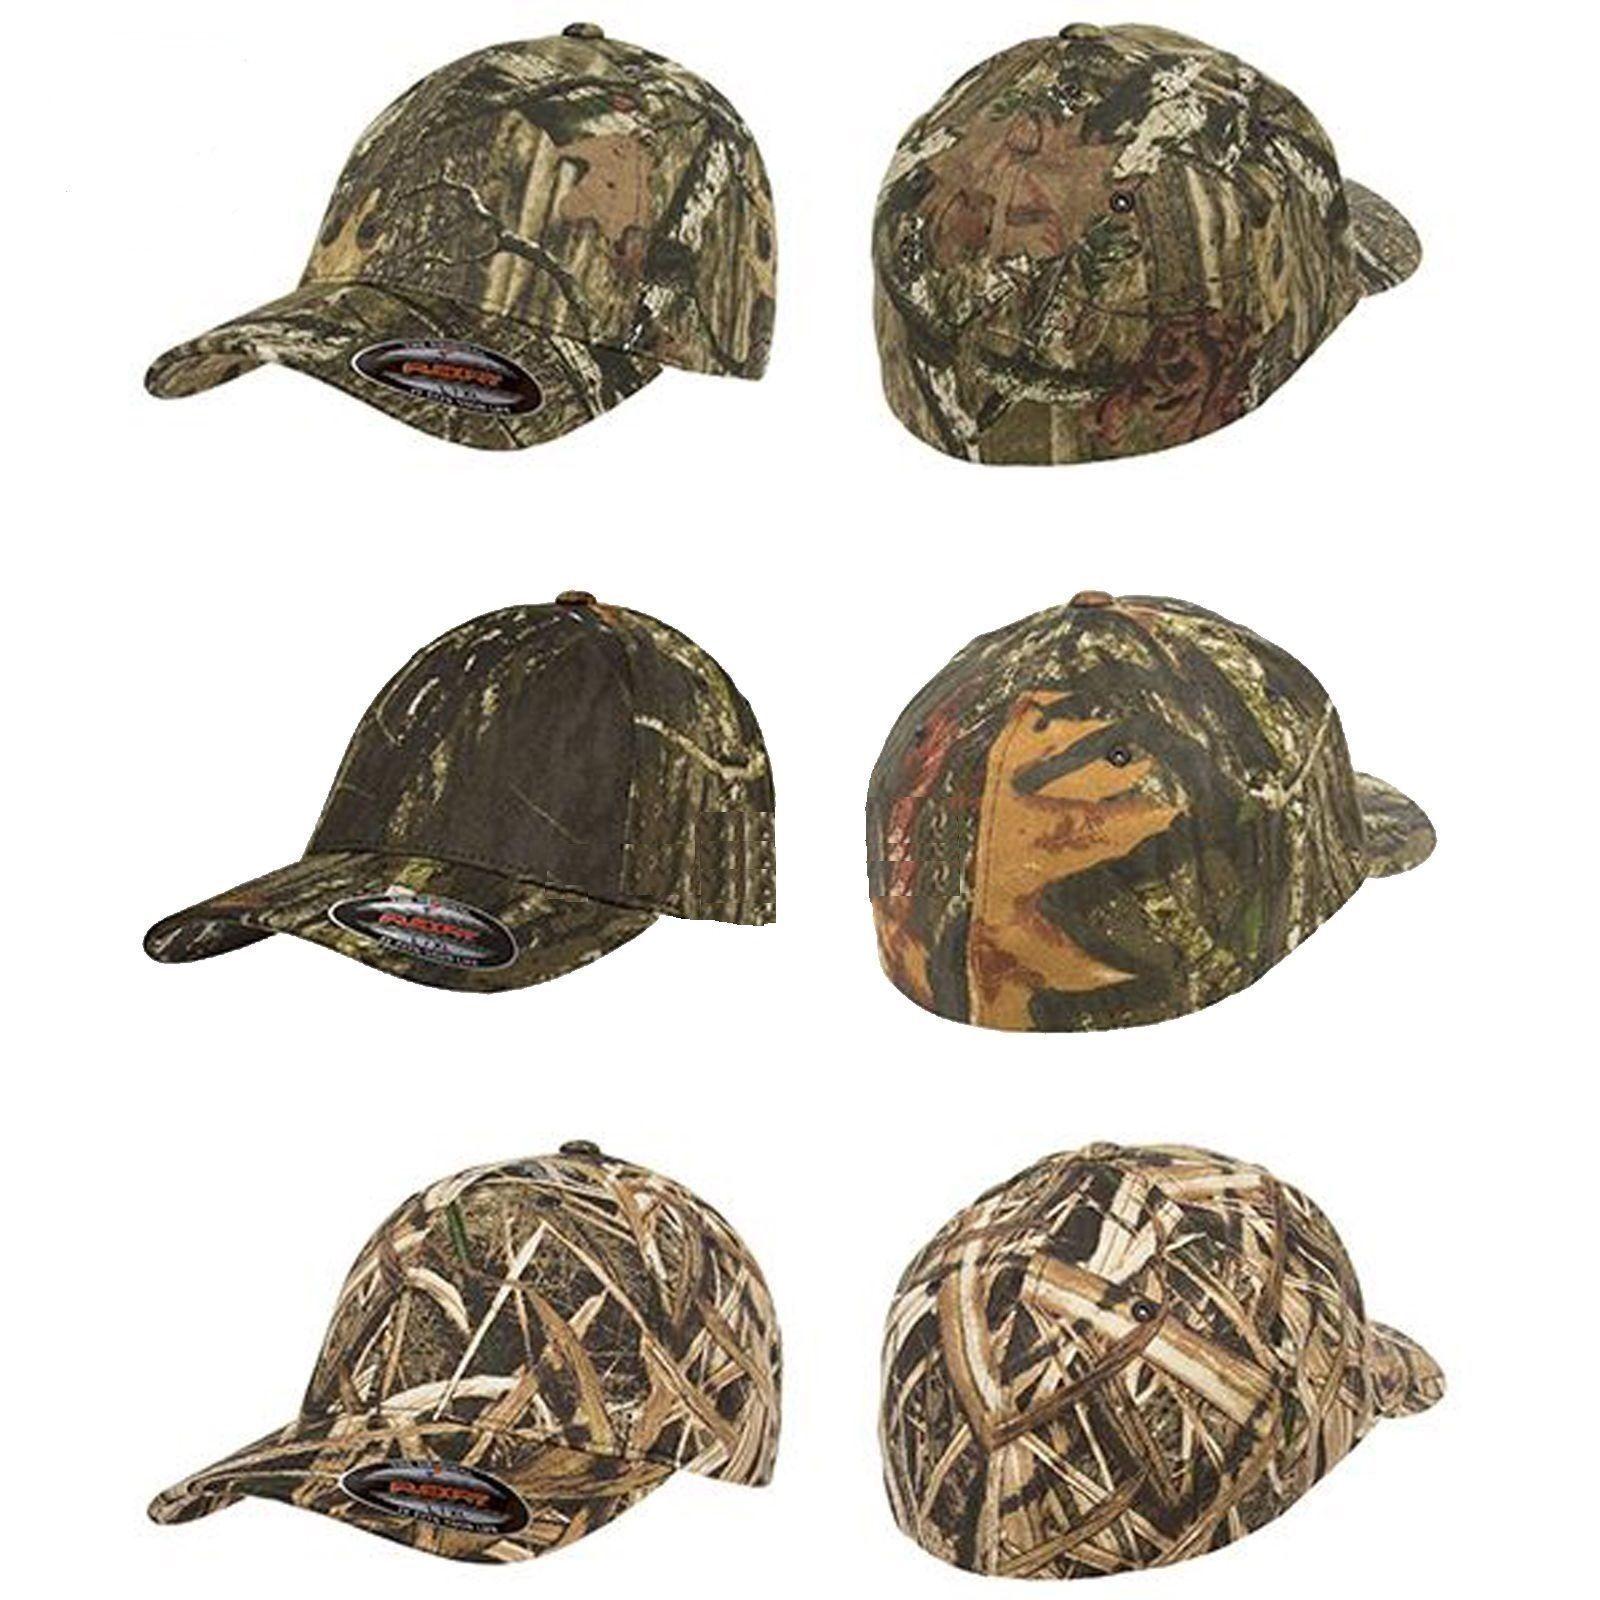 Flexfit Oak Camouflage Cap real-tree hunting fishing baseball hat S//M L//XL 6999